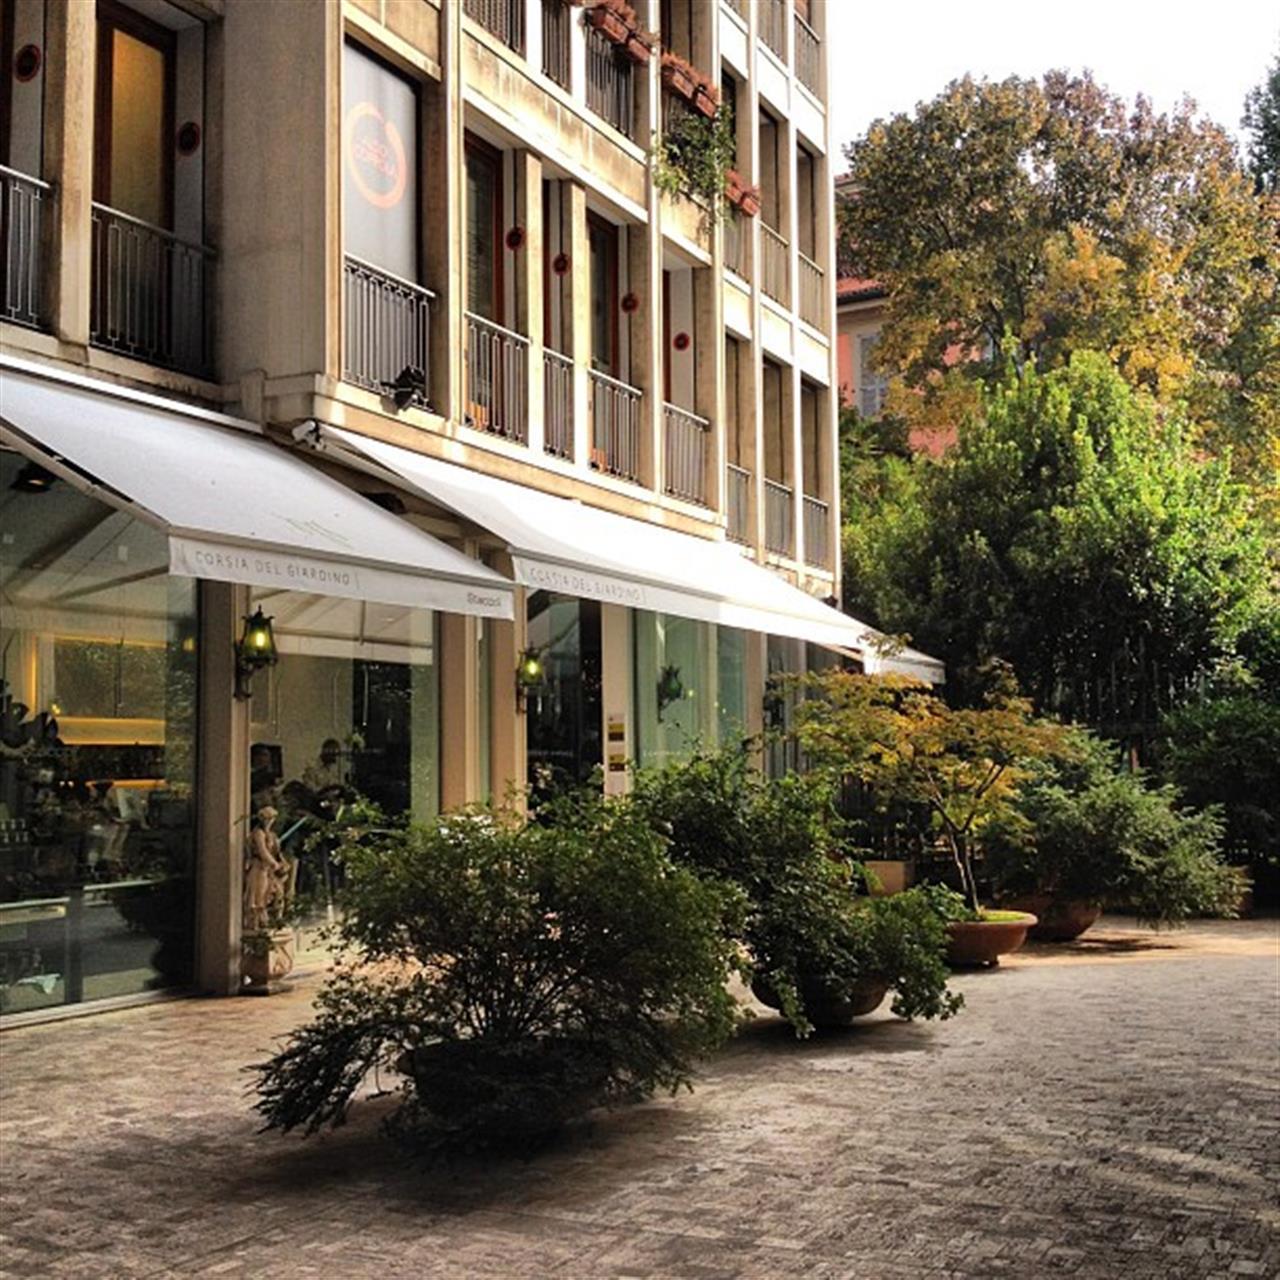 #Milano hides beautiful gardens!